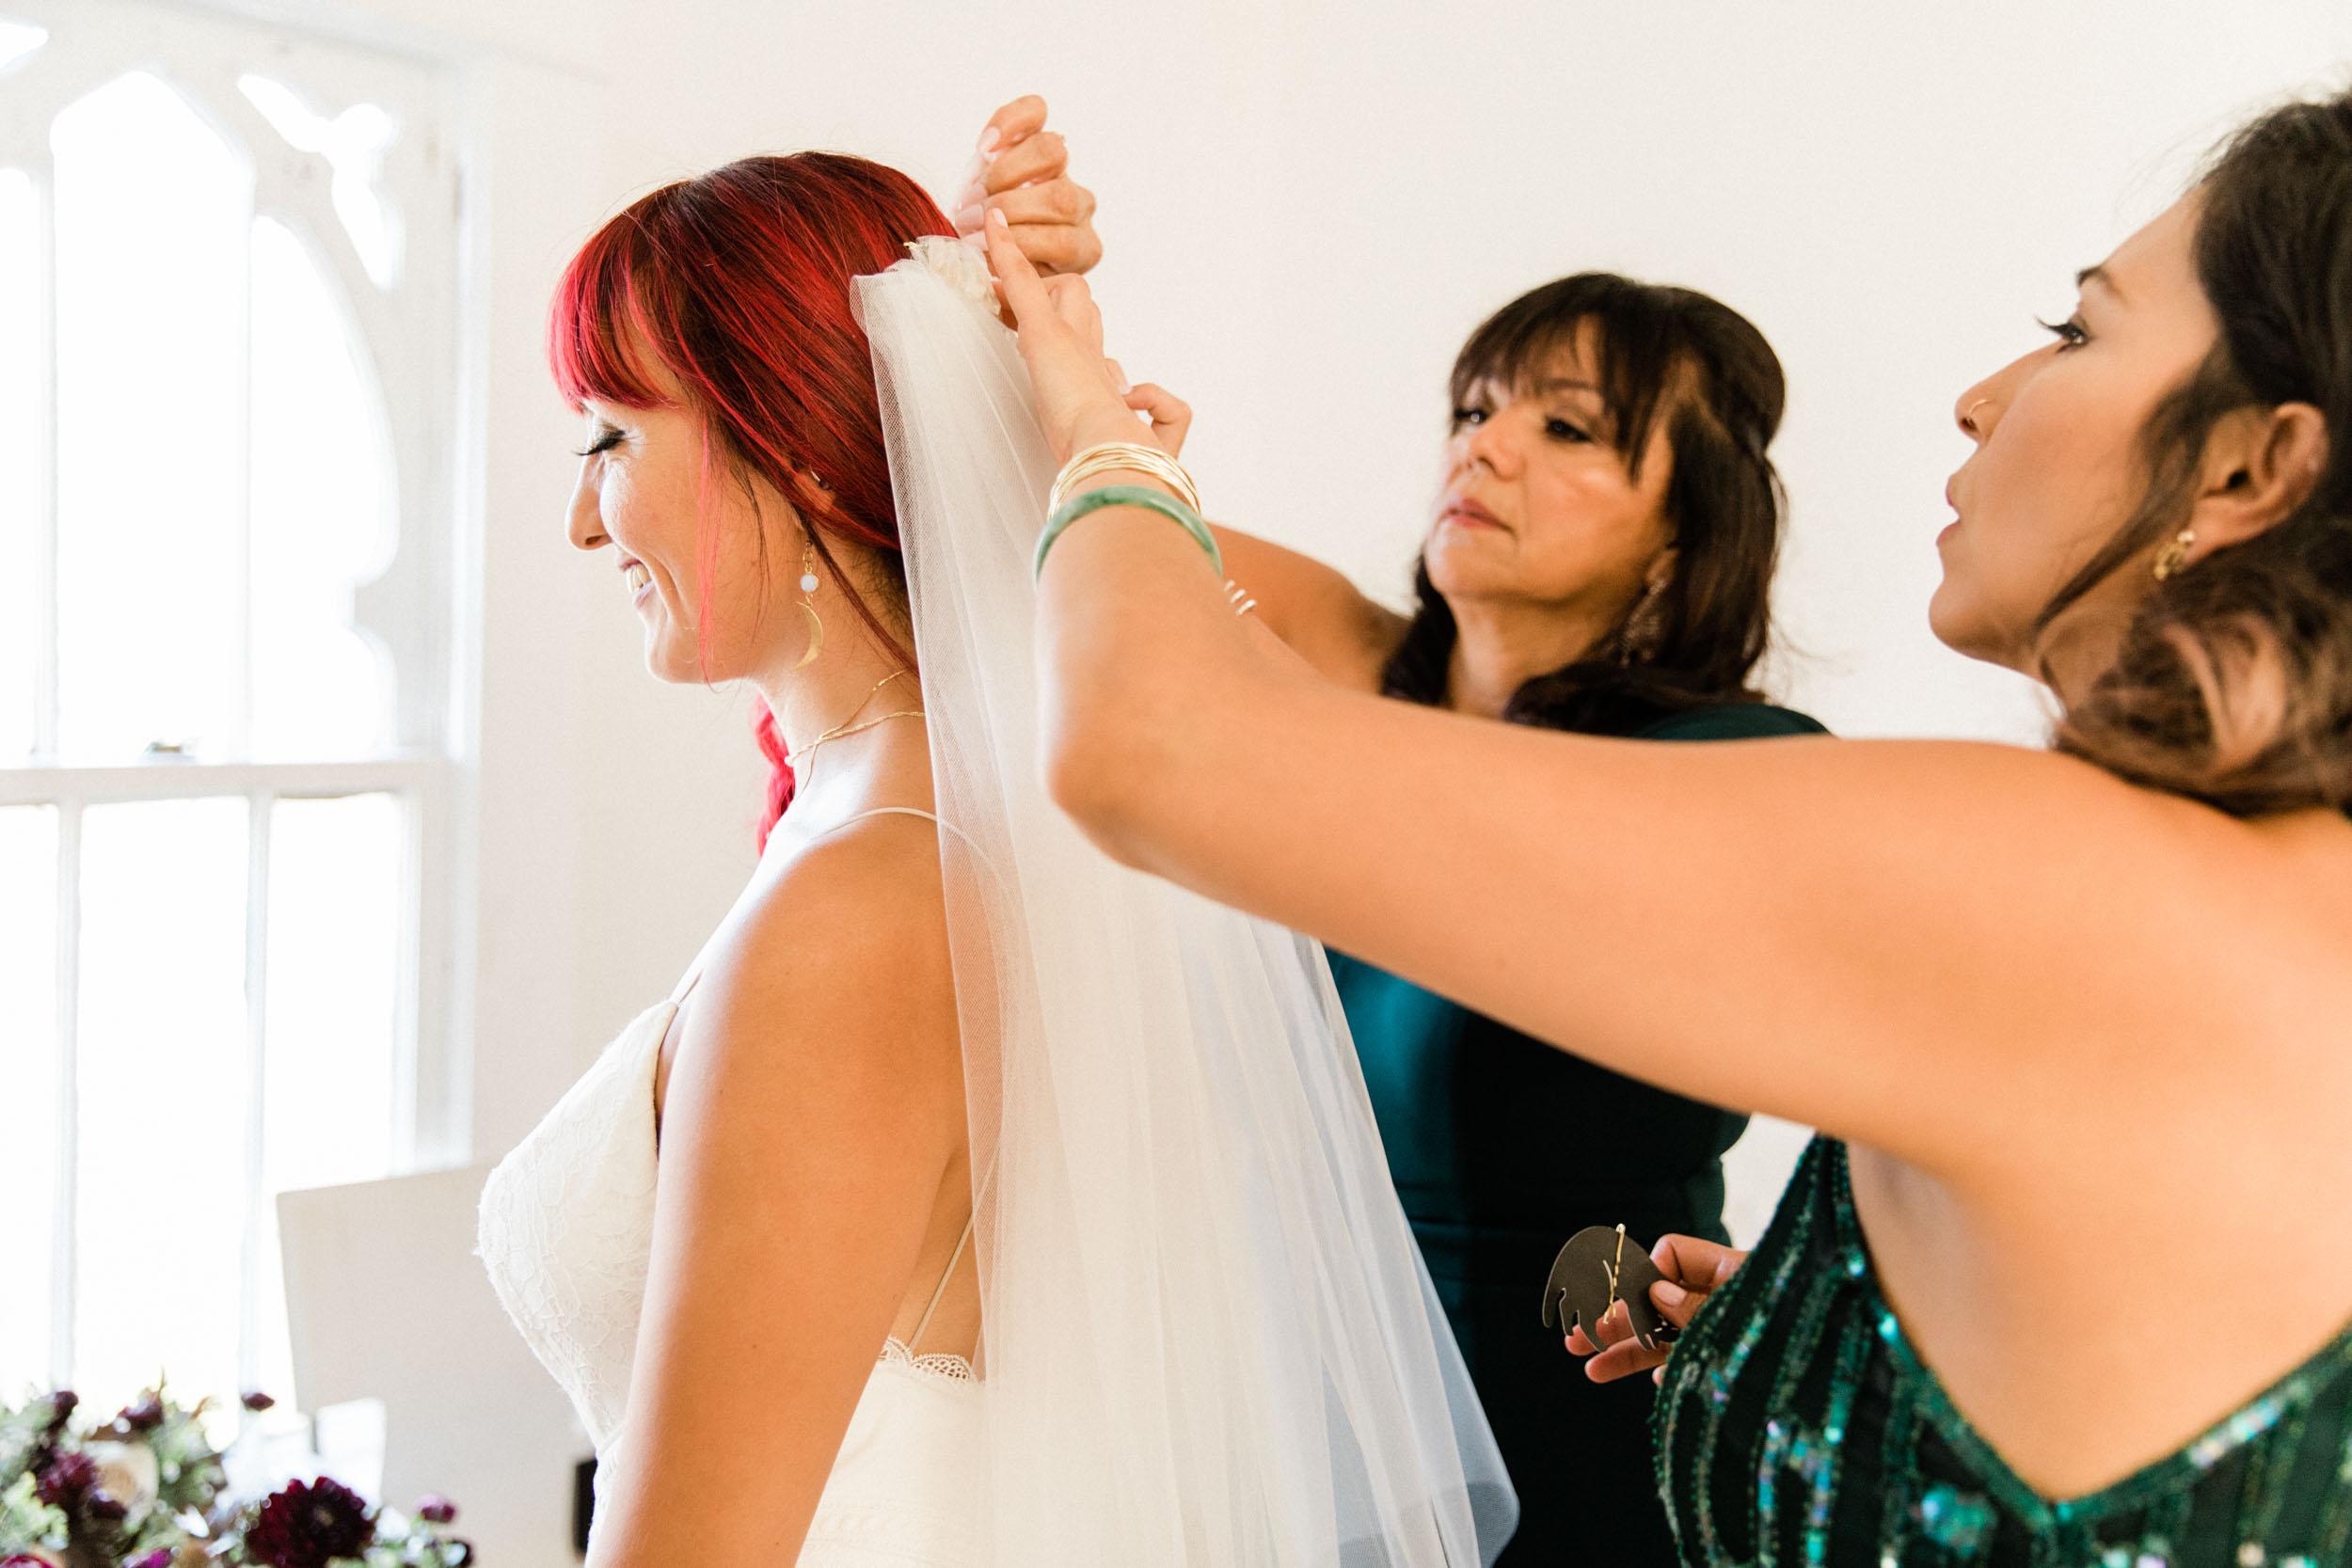 BKM-Photography-Los-Angeles-Highland-Park-York-Manor-Wedding-Photography-0608.jpg